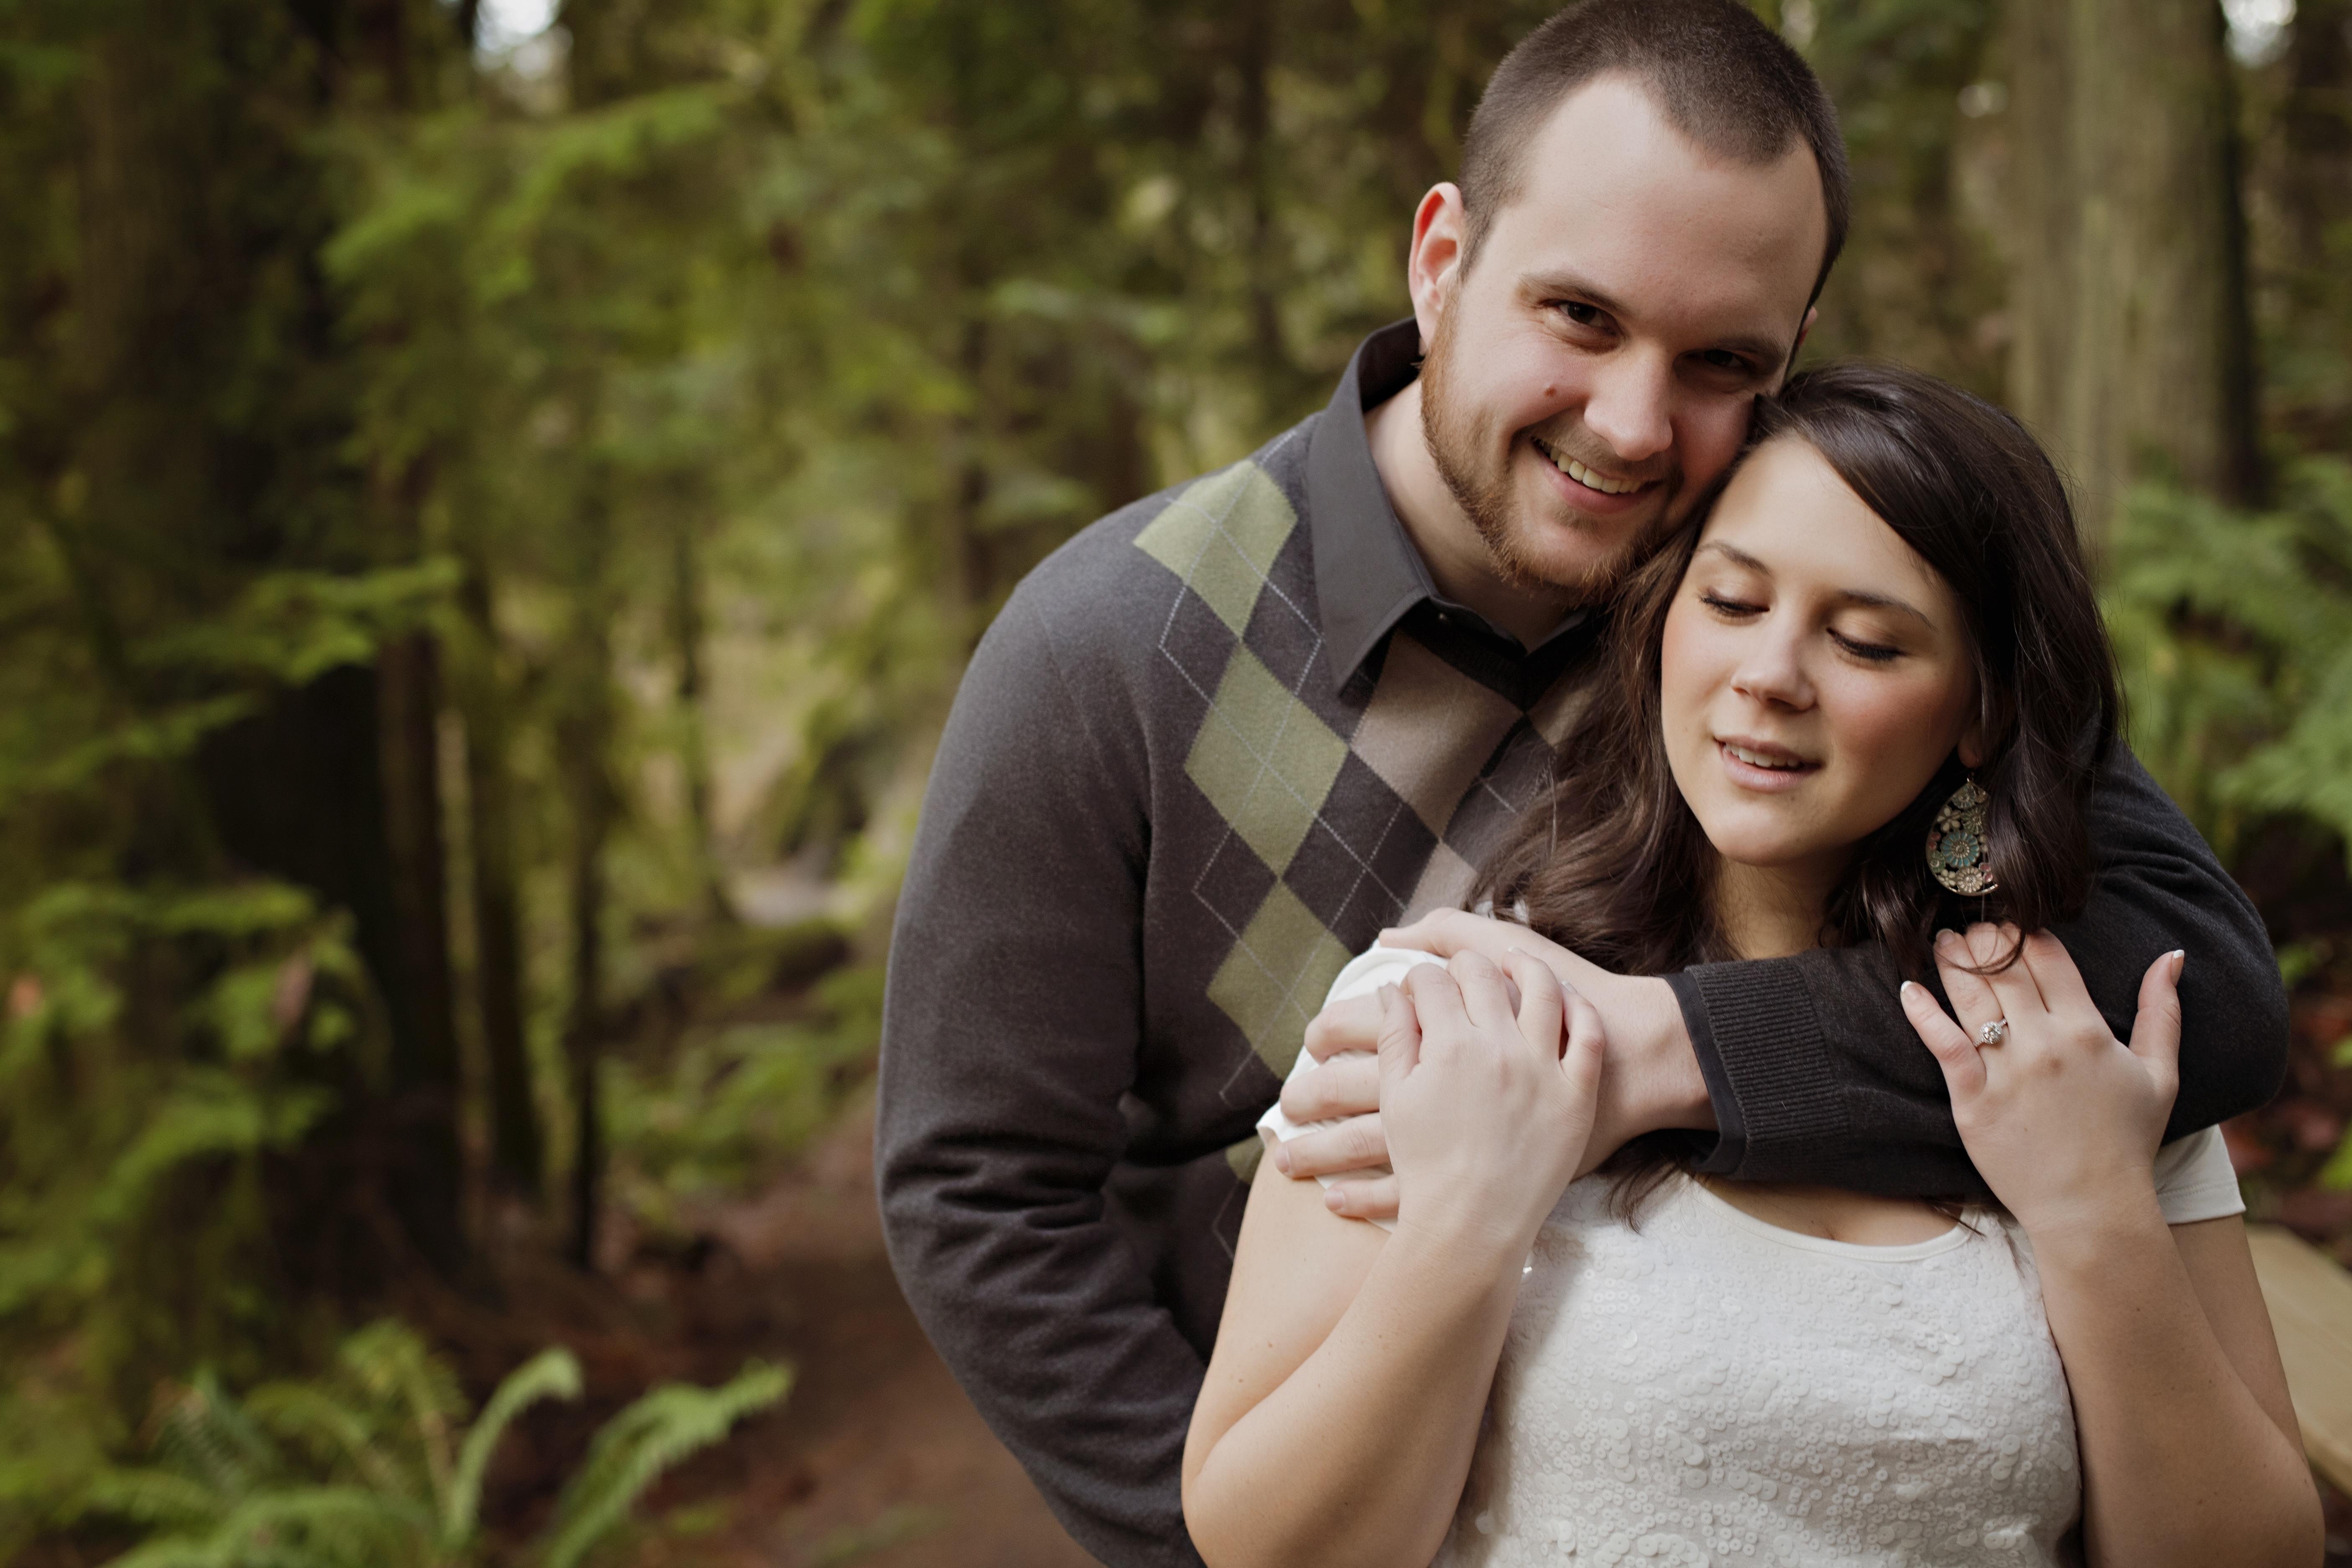 Rento dating ja halailemaan